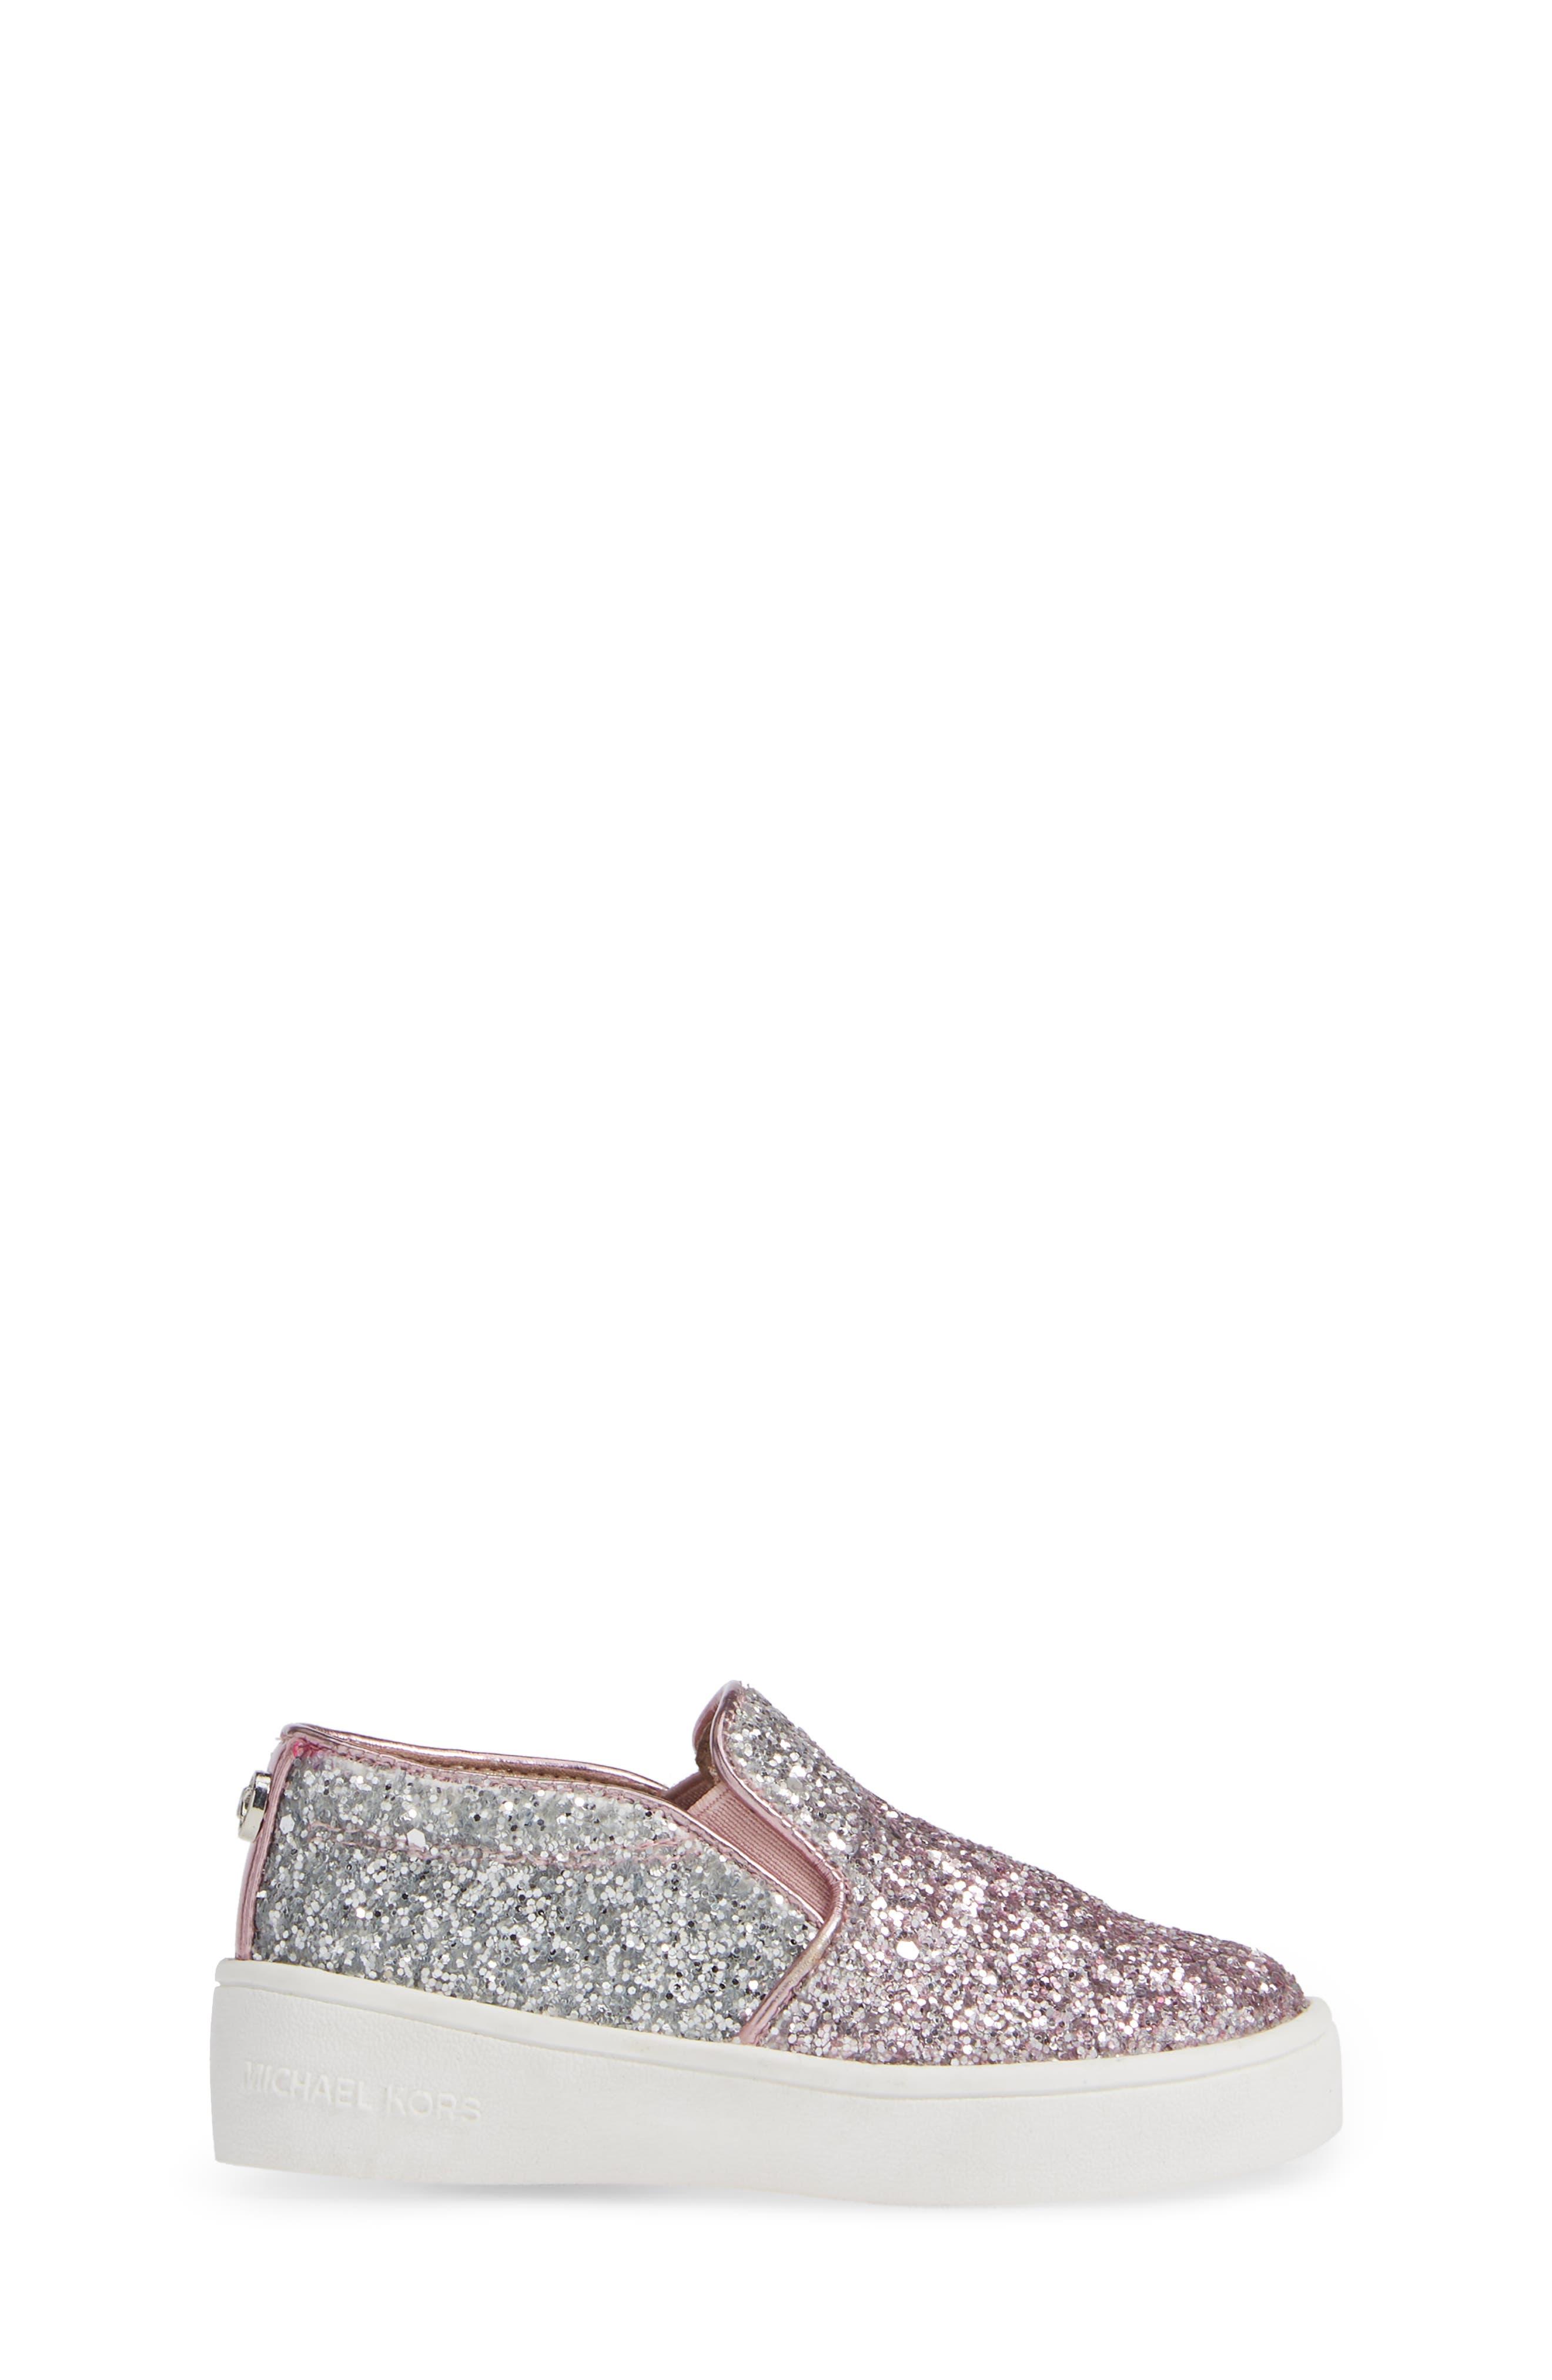 Ivy Ombré Glitter Slip-On Sneaker,                             Alternate thumbnail 3, color,                             PINK SILVER